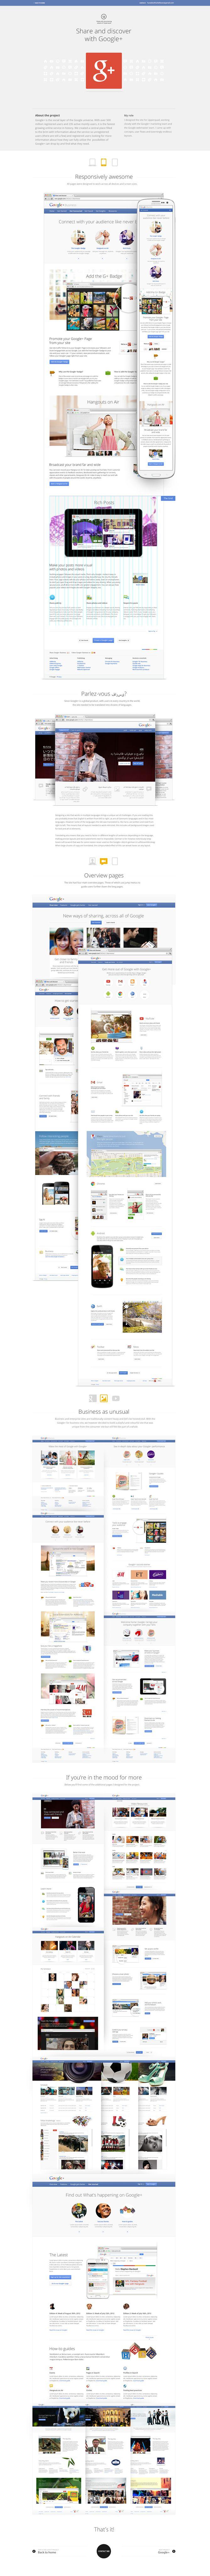 Responsive Web Design // Google Case Study